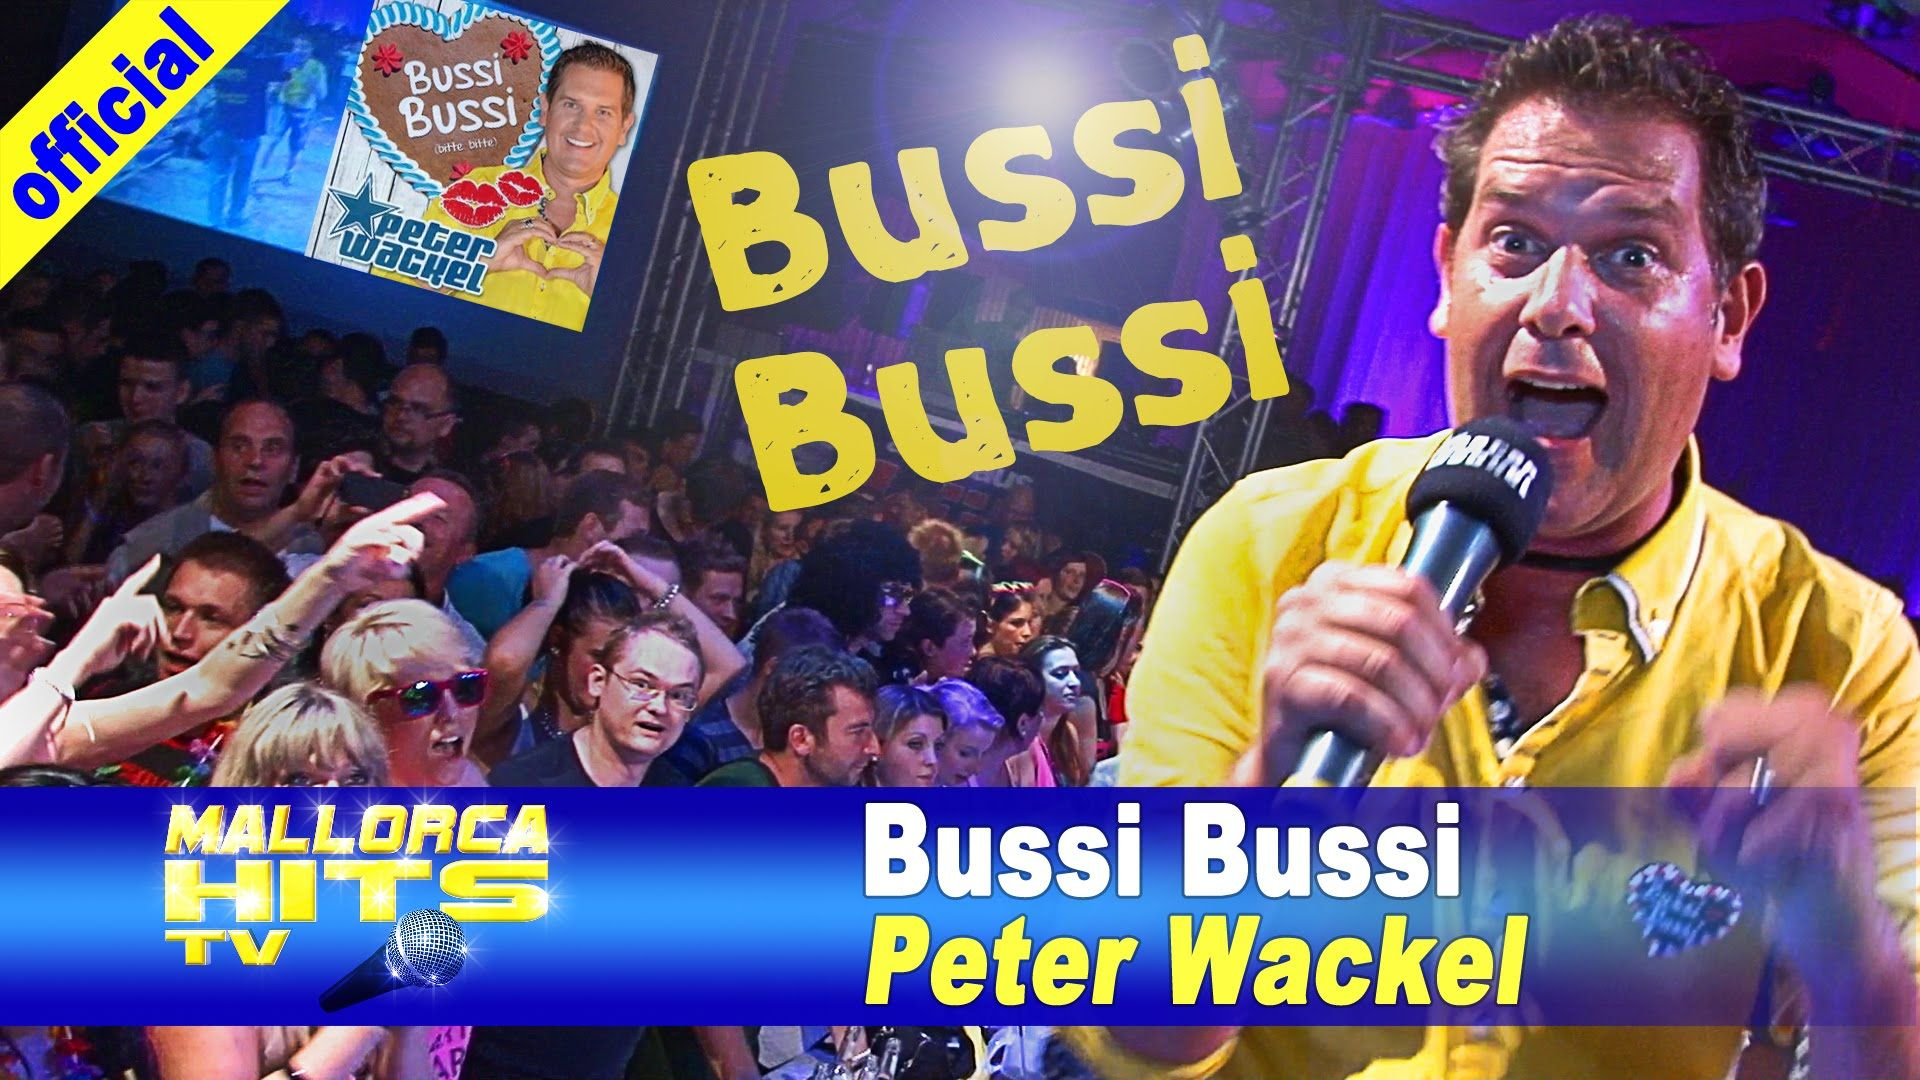 "Peter Wackel´s neuer Hit ""Bussi Bussi (bitte bitte)"" - das erste offizielle Musikvideo von Peter Wackel´s neuem Song.  http://mallorcahitstv.de/2014/09/peter-wackel-bussi-bussi/"